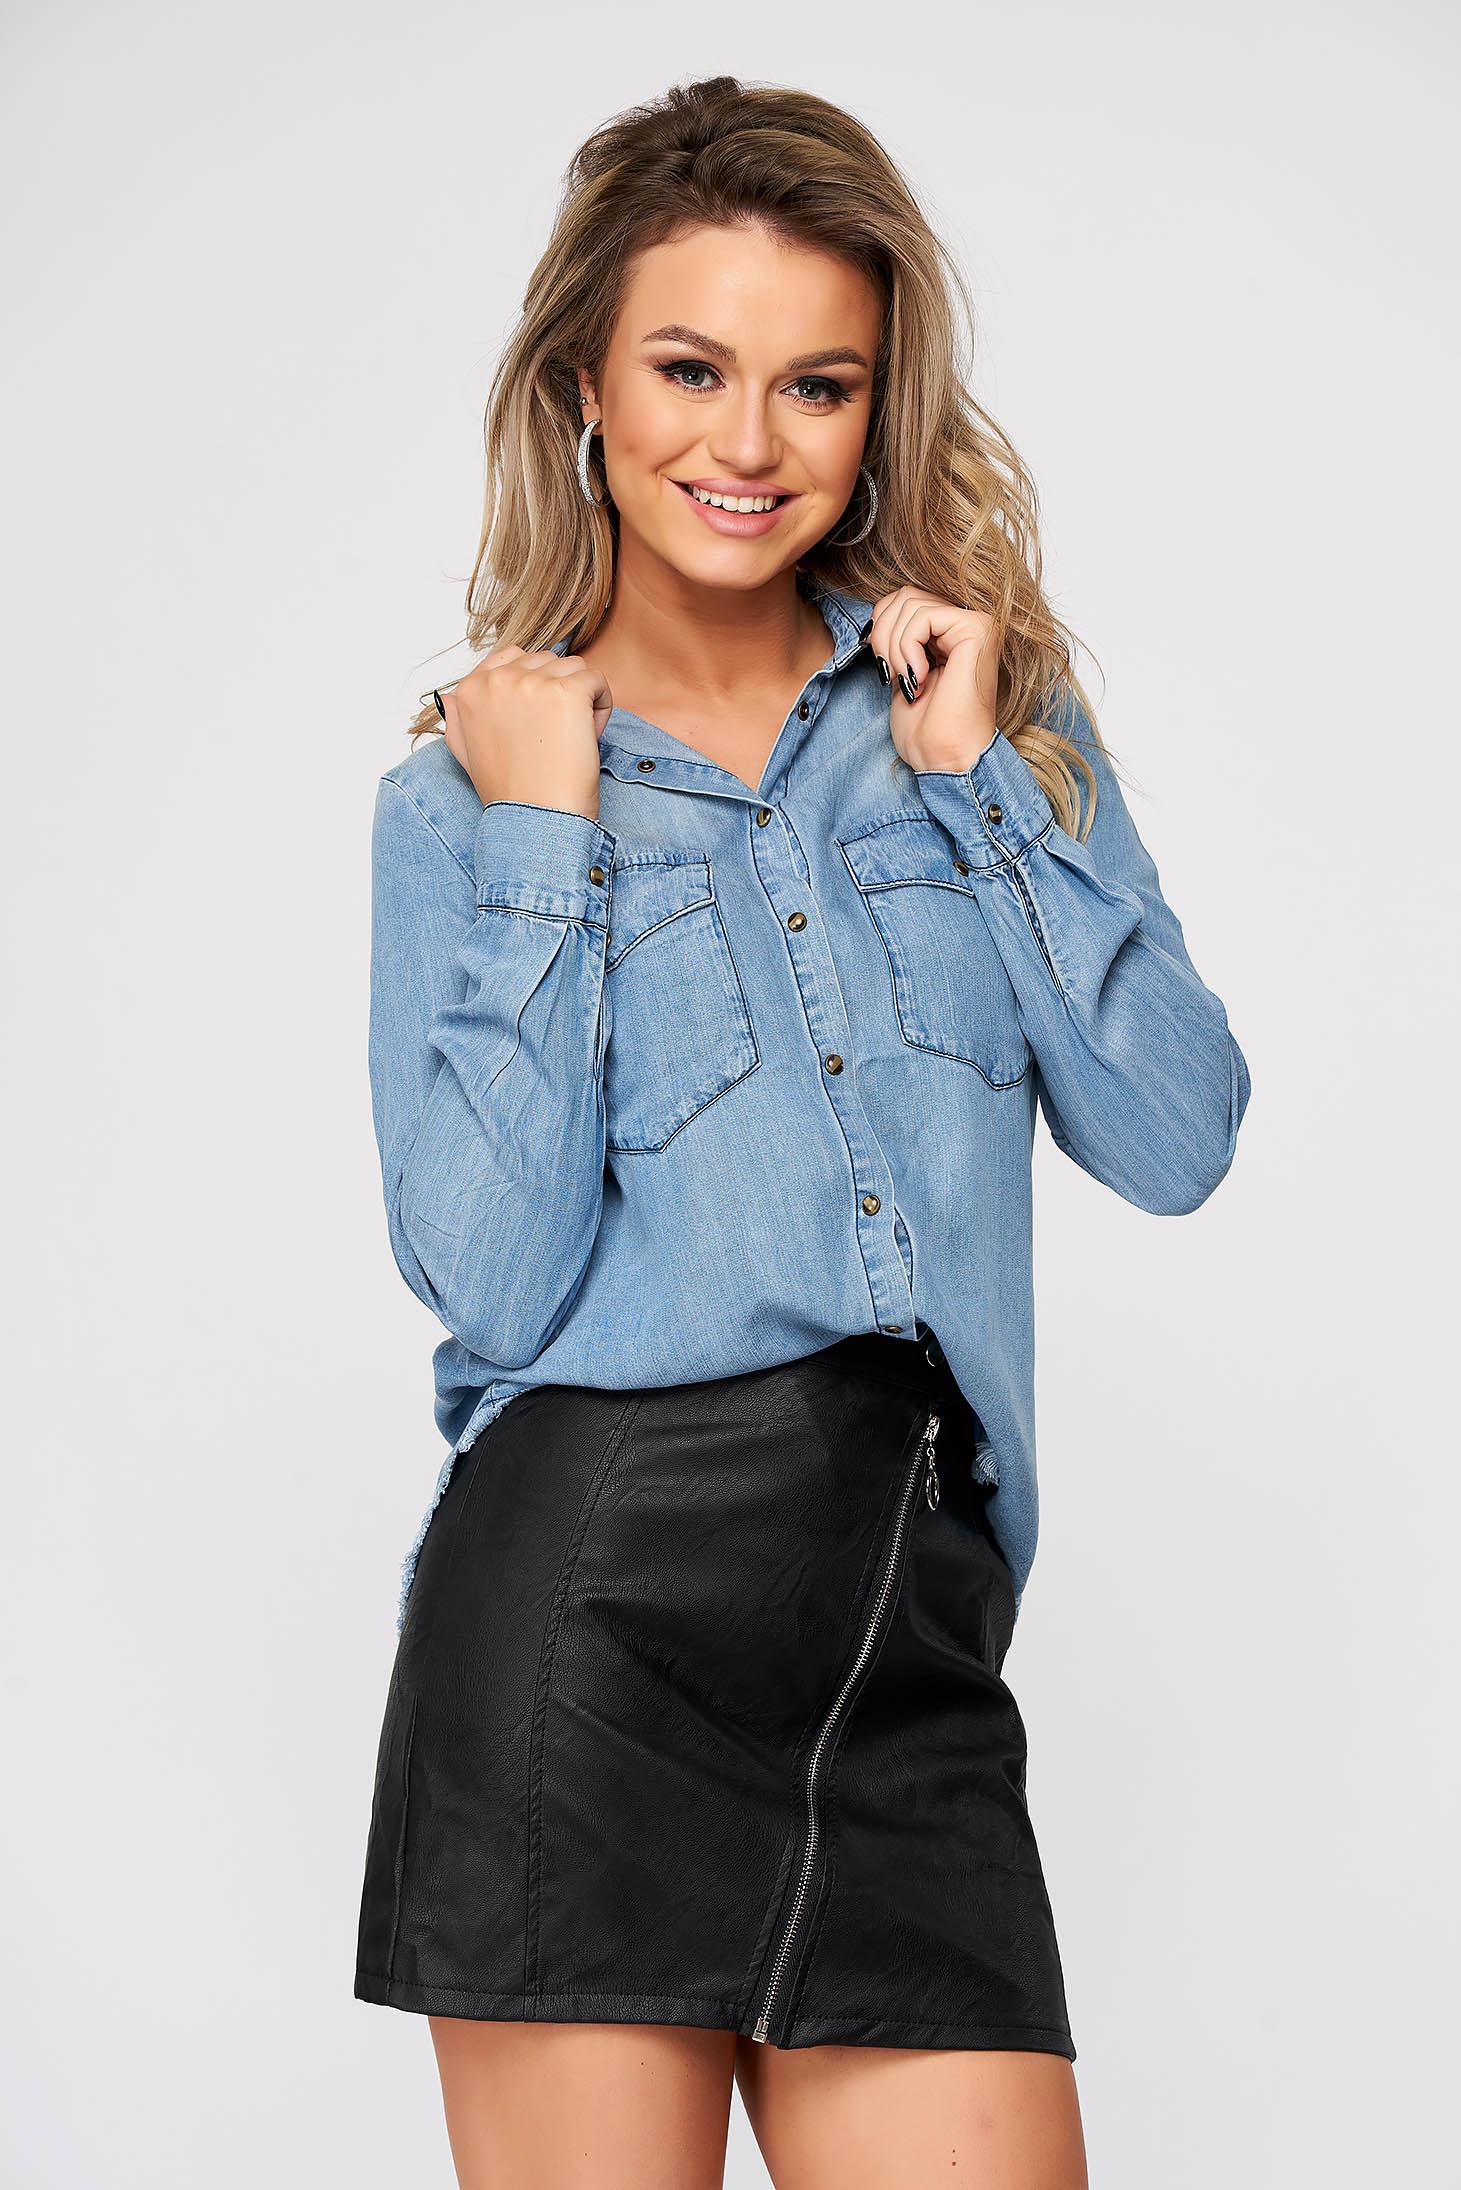 Blue women`s shirt casual flared long sleeved denim